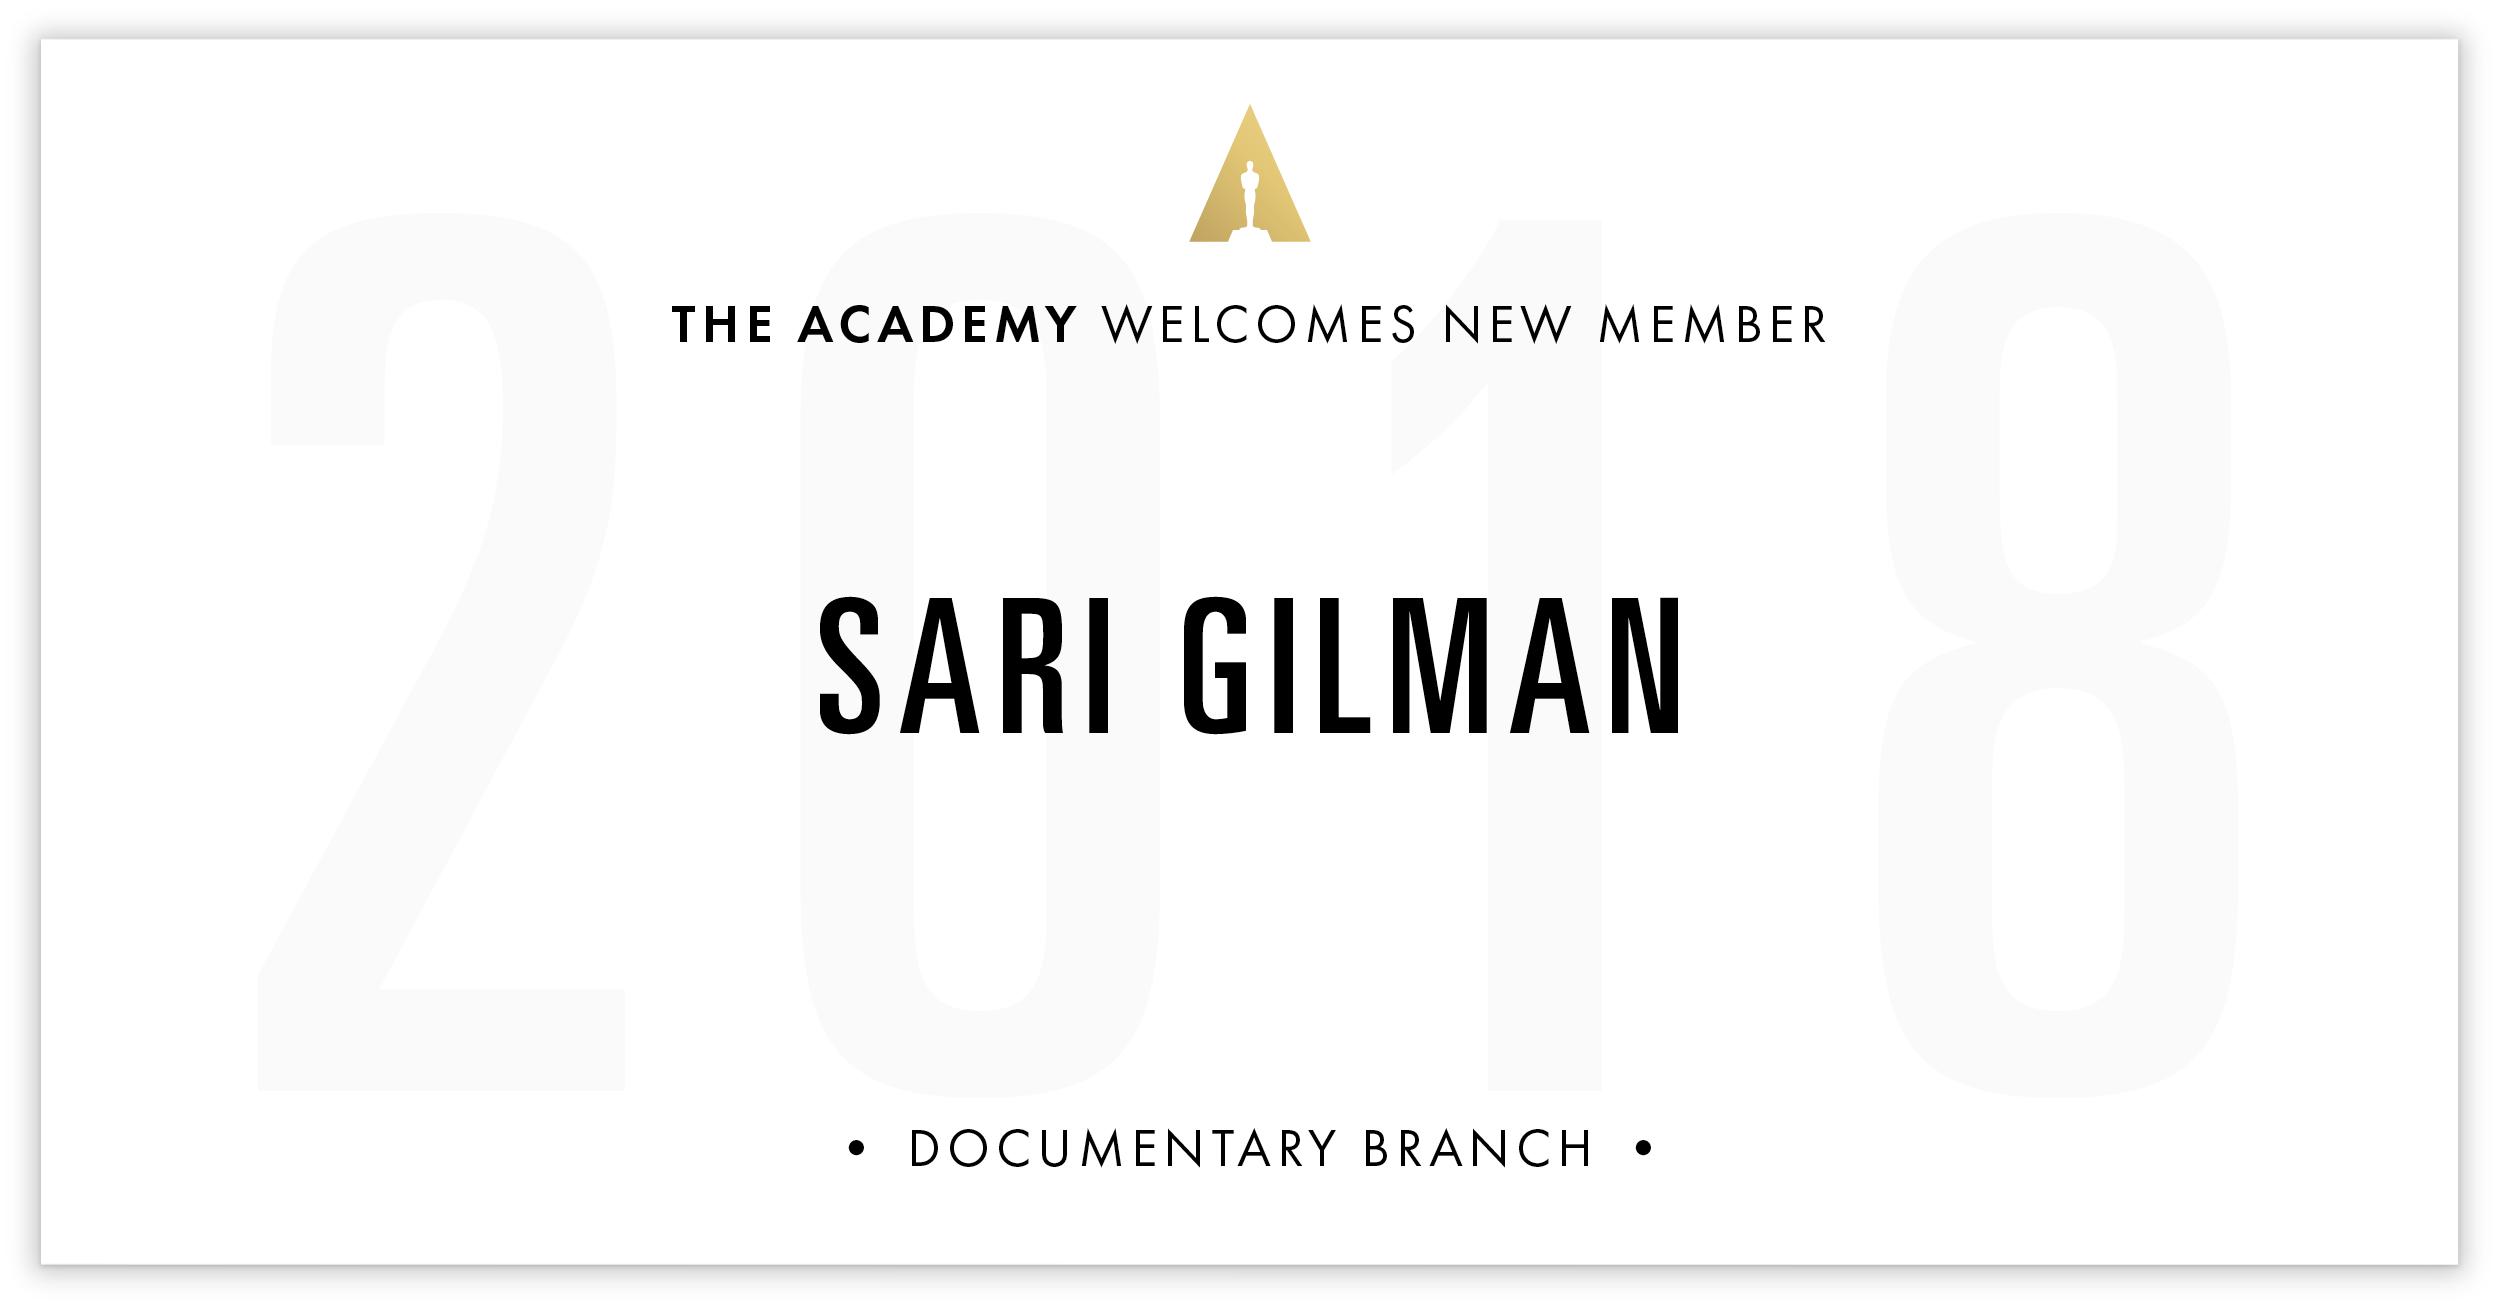 Sari Gilman is invited!